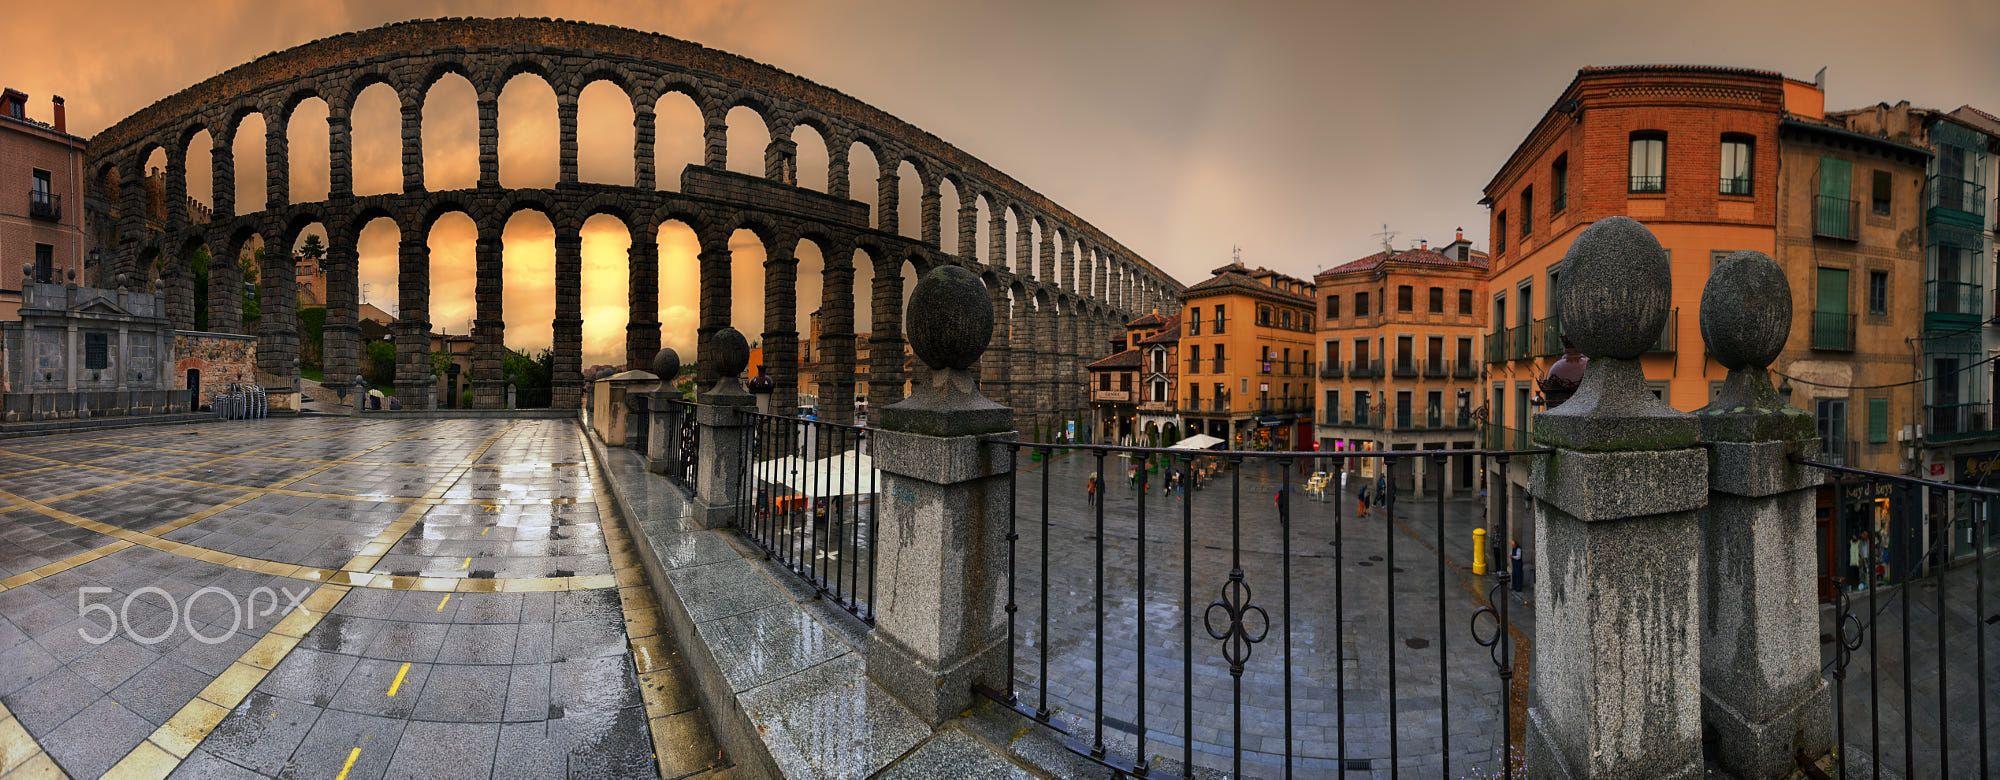 Segovia by Ana Tramont on 500px